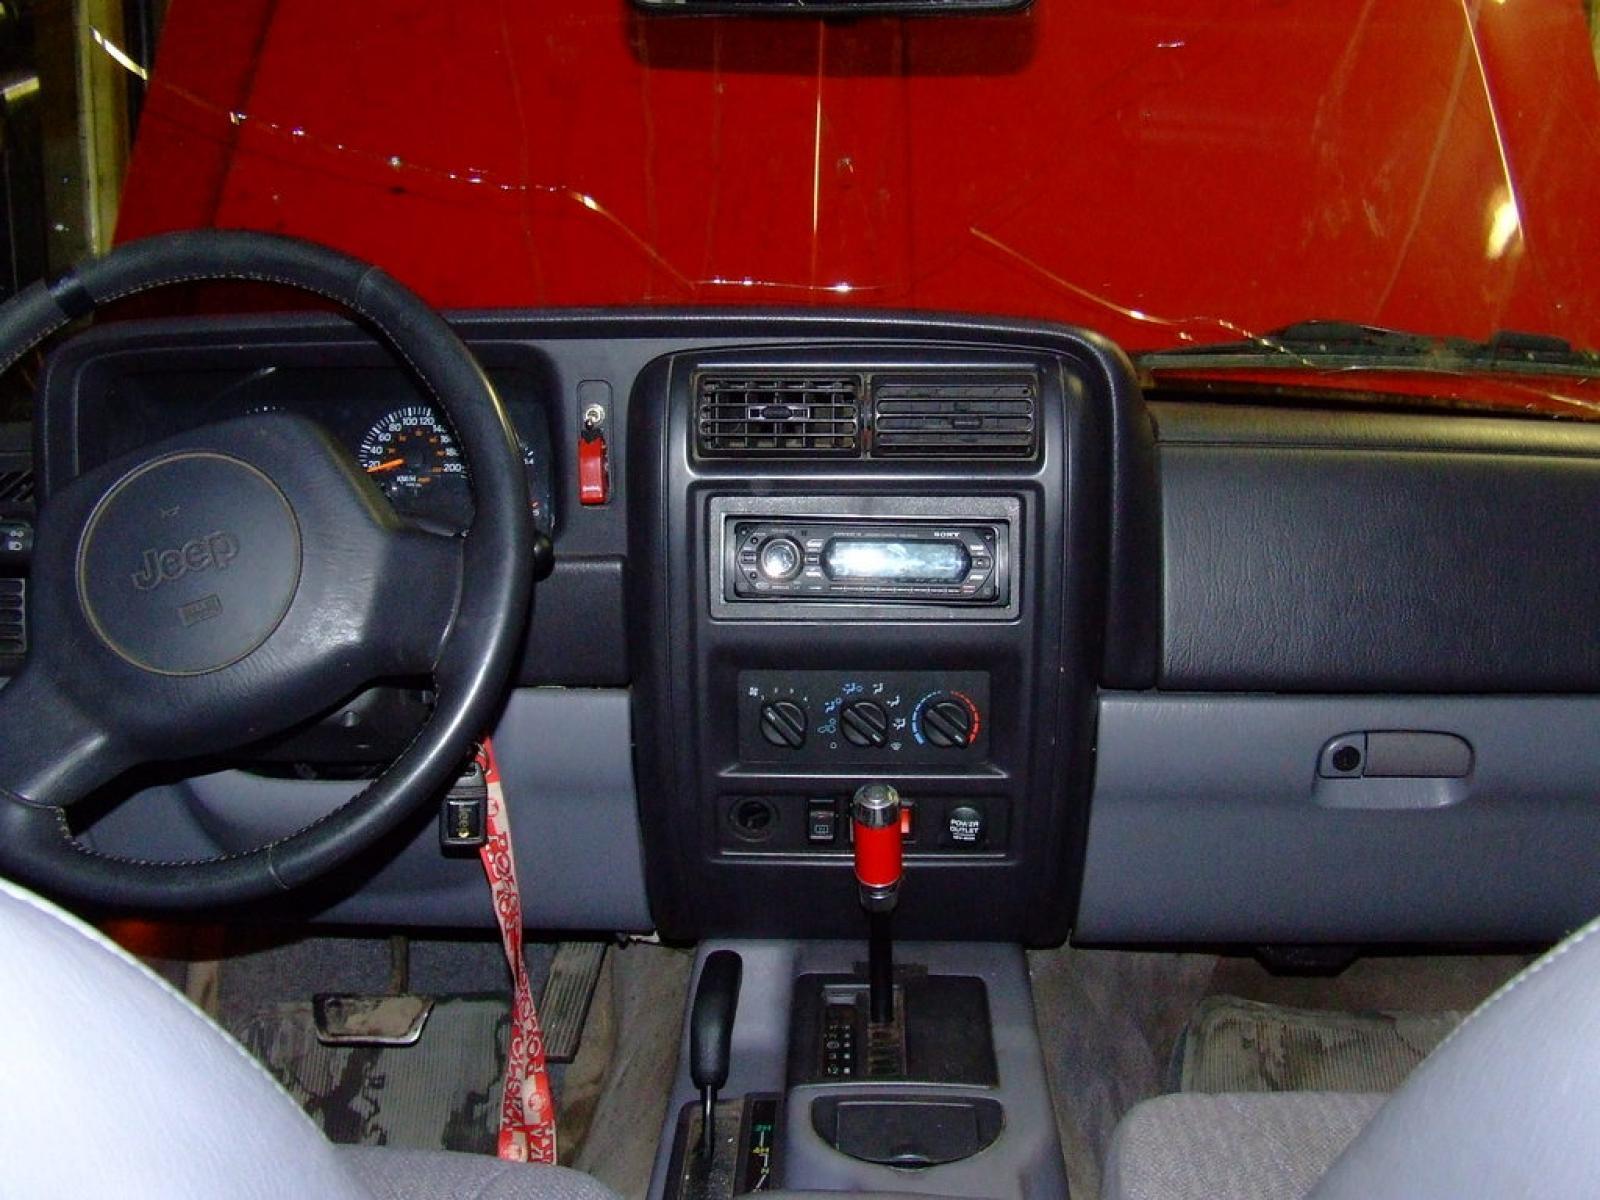 800 1024 1280 1600 Origin 1997 Jeep Cherokee ...